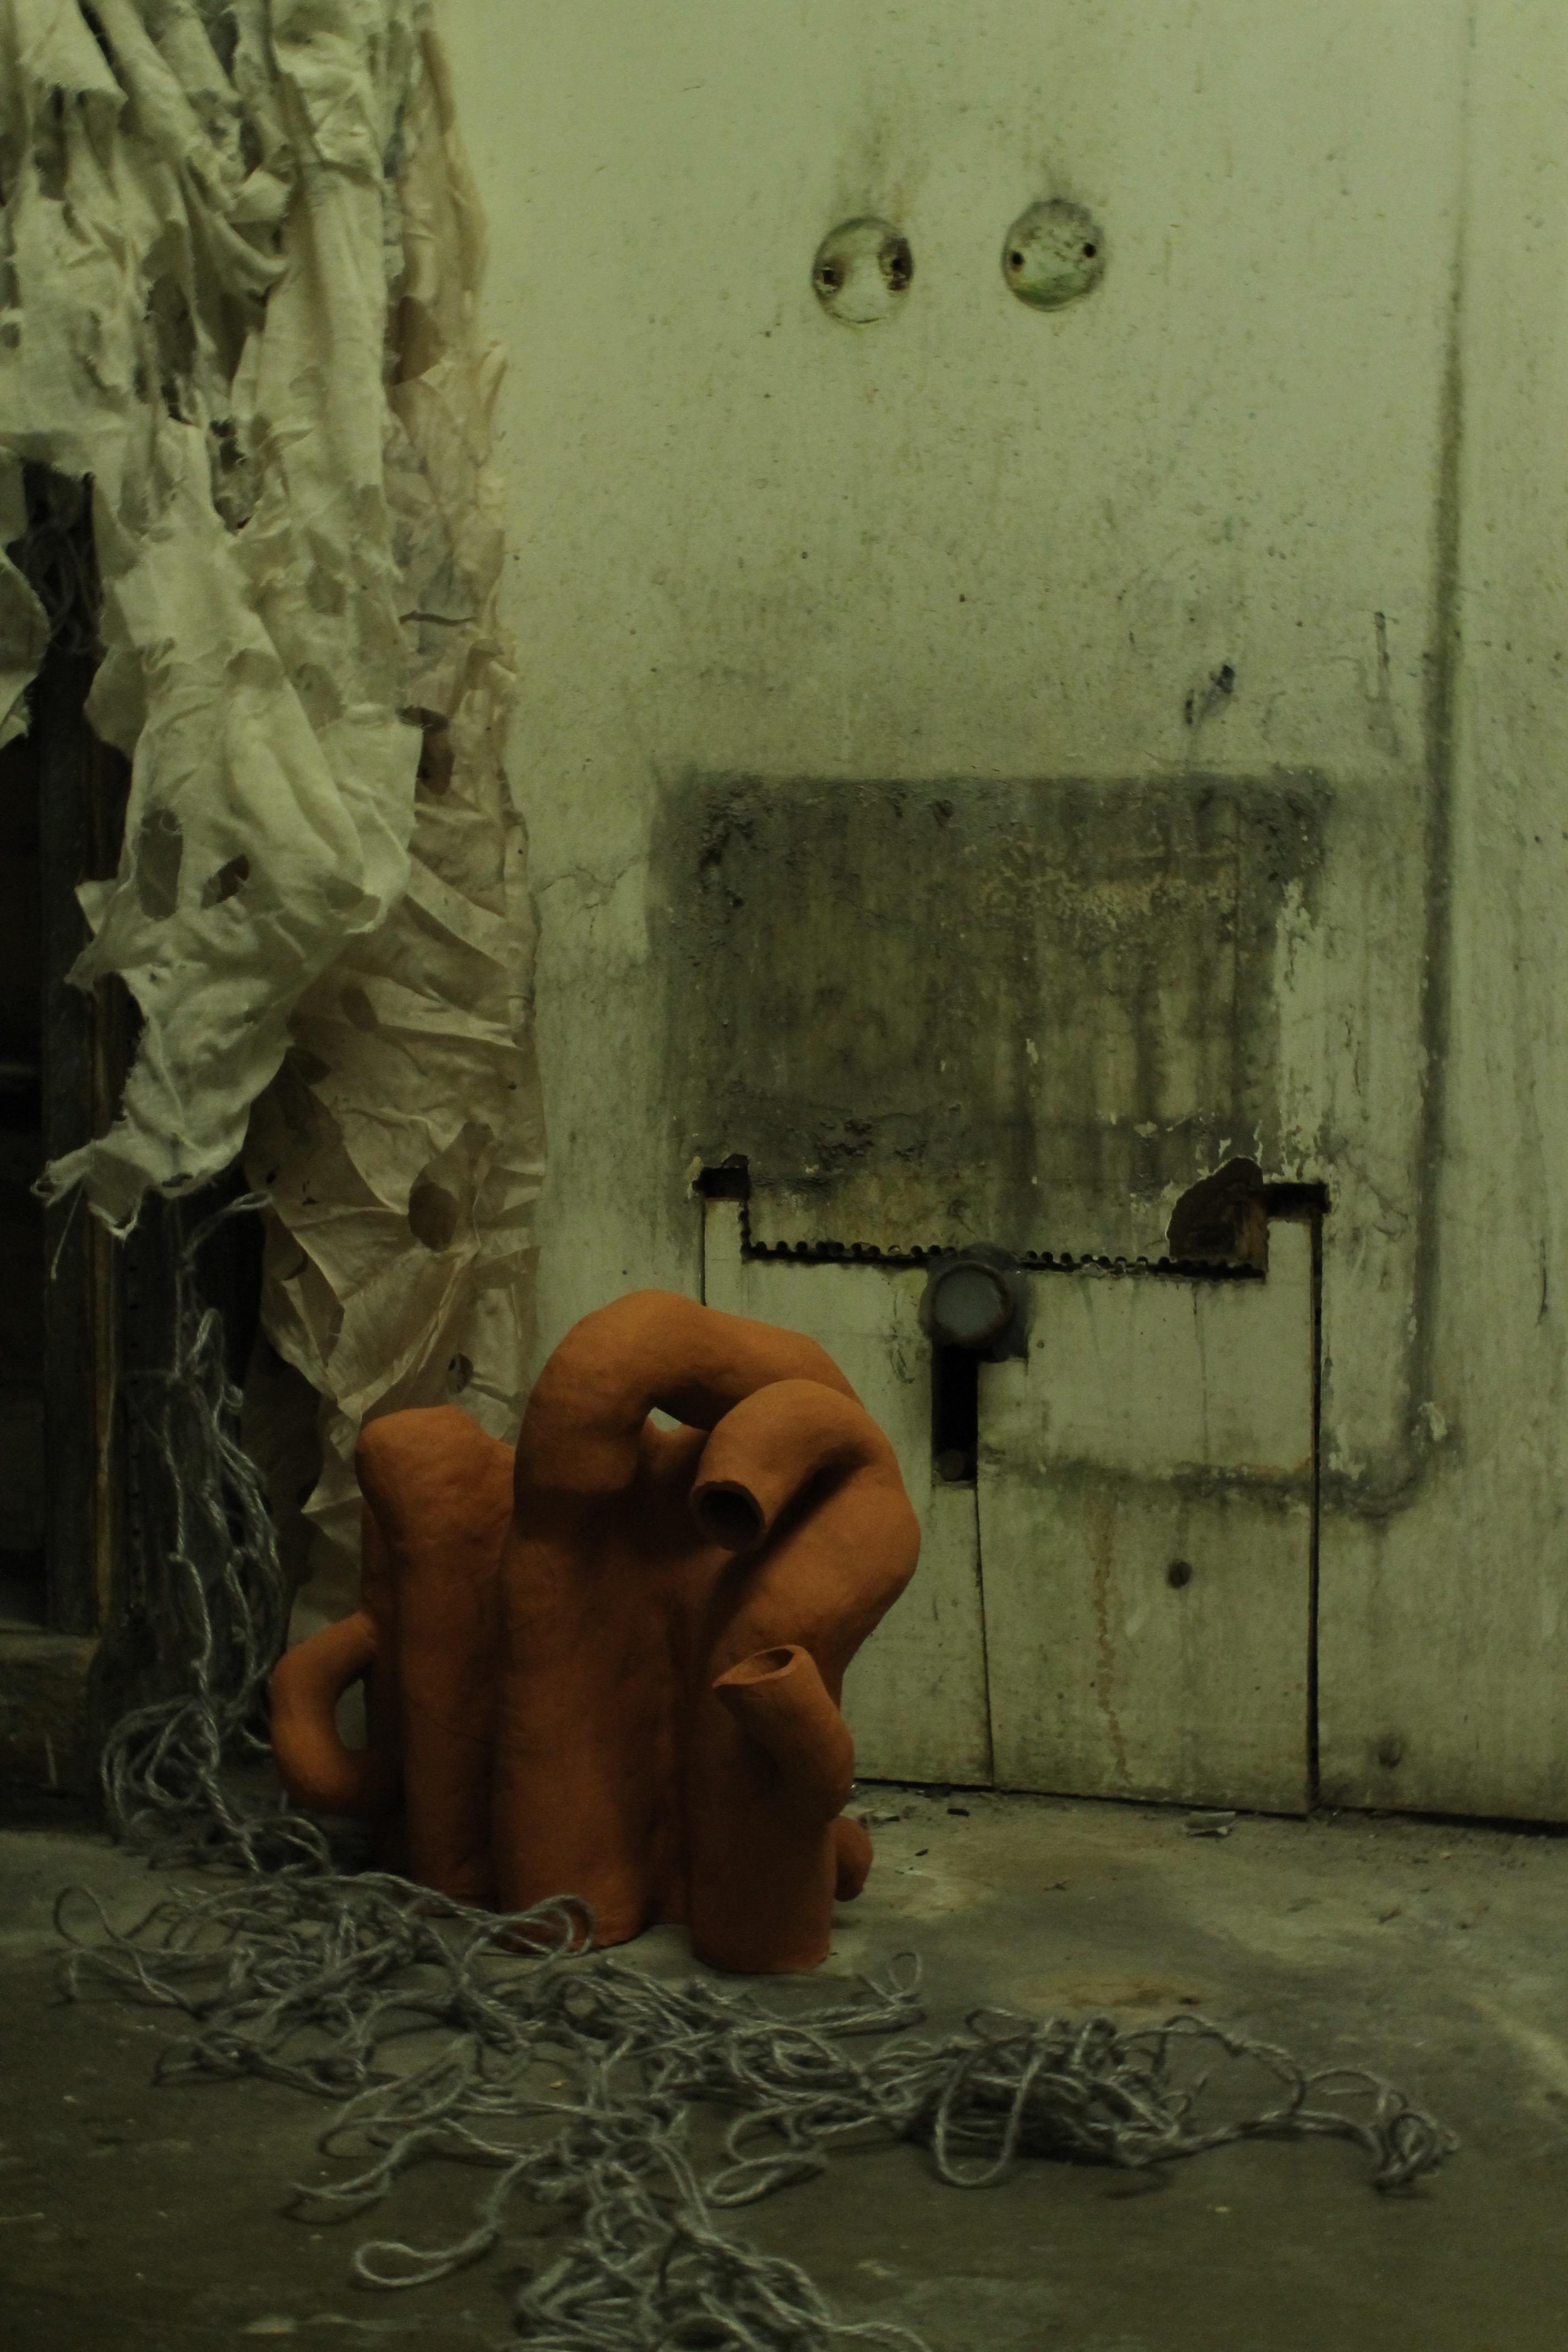 Charlotte Smith, installation detail: <em>Becoming a becoming of a becoming that might become a becoming</em>